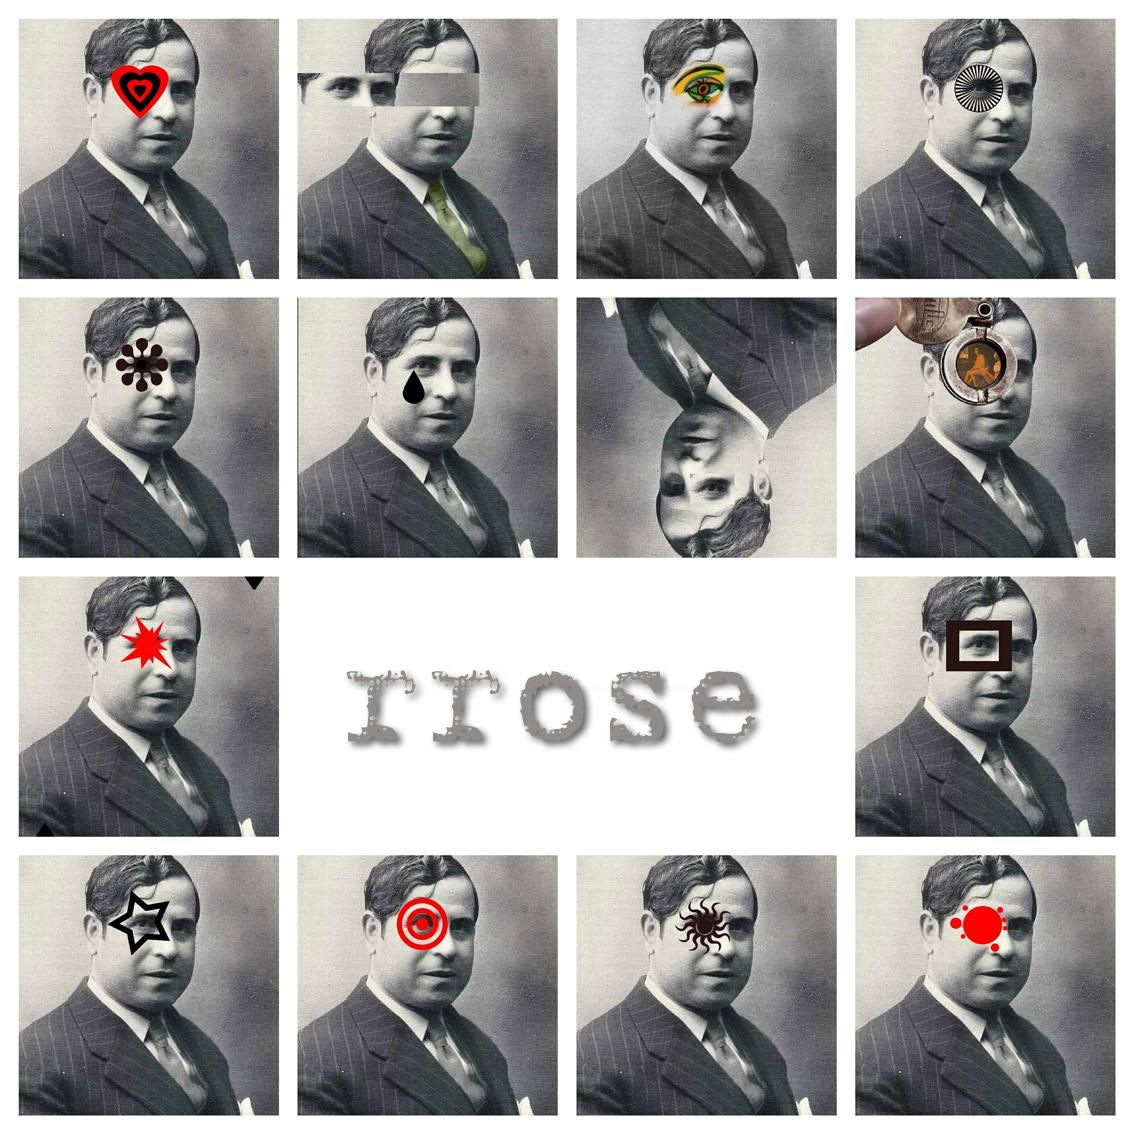 Rrose